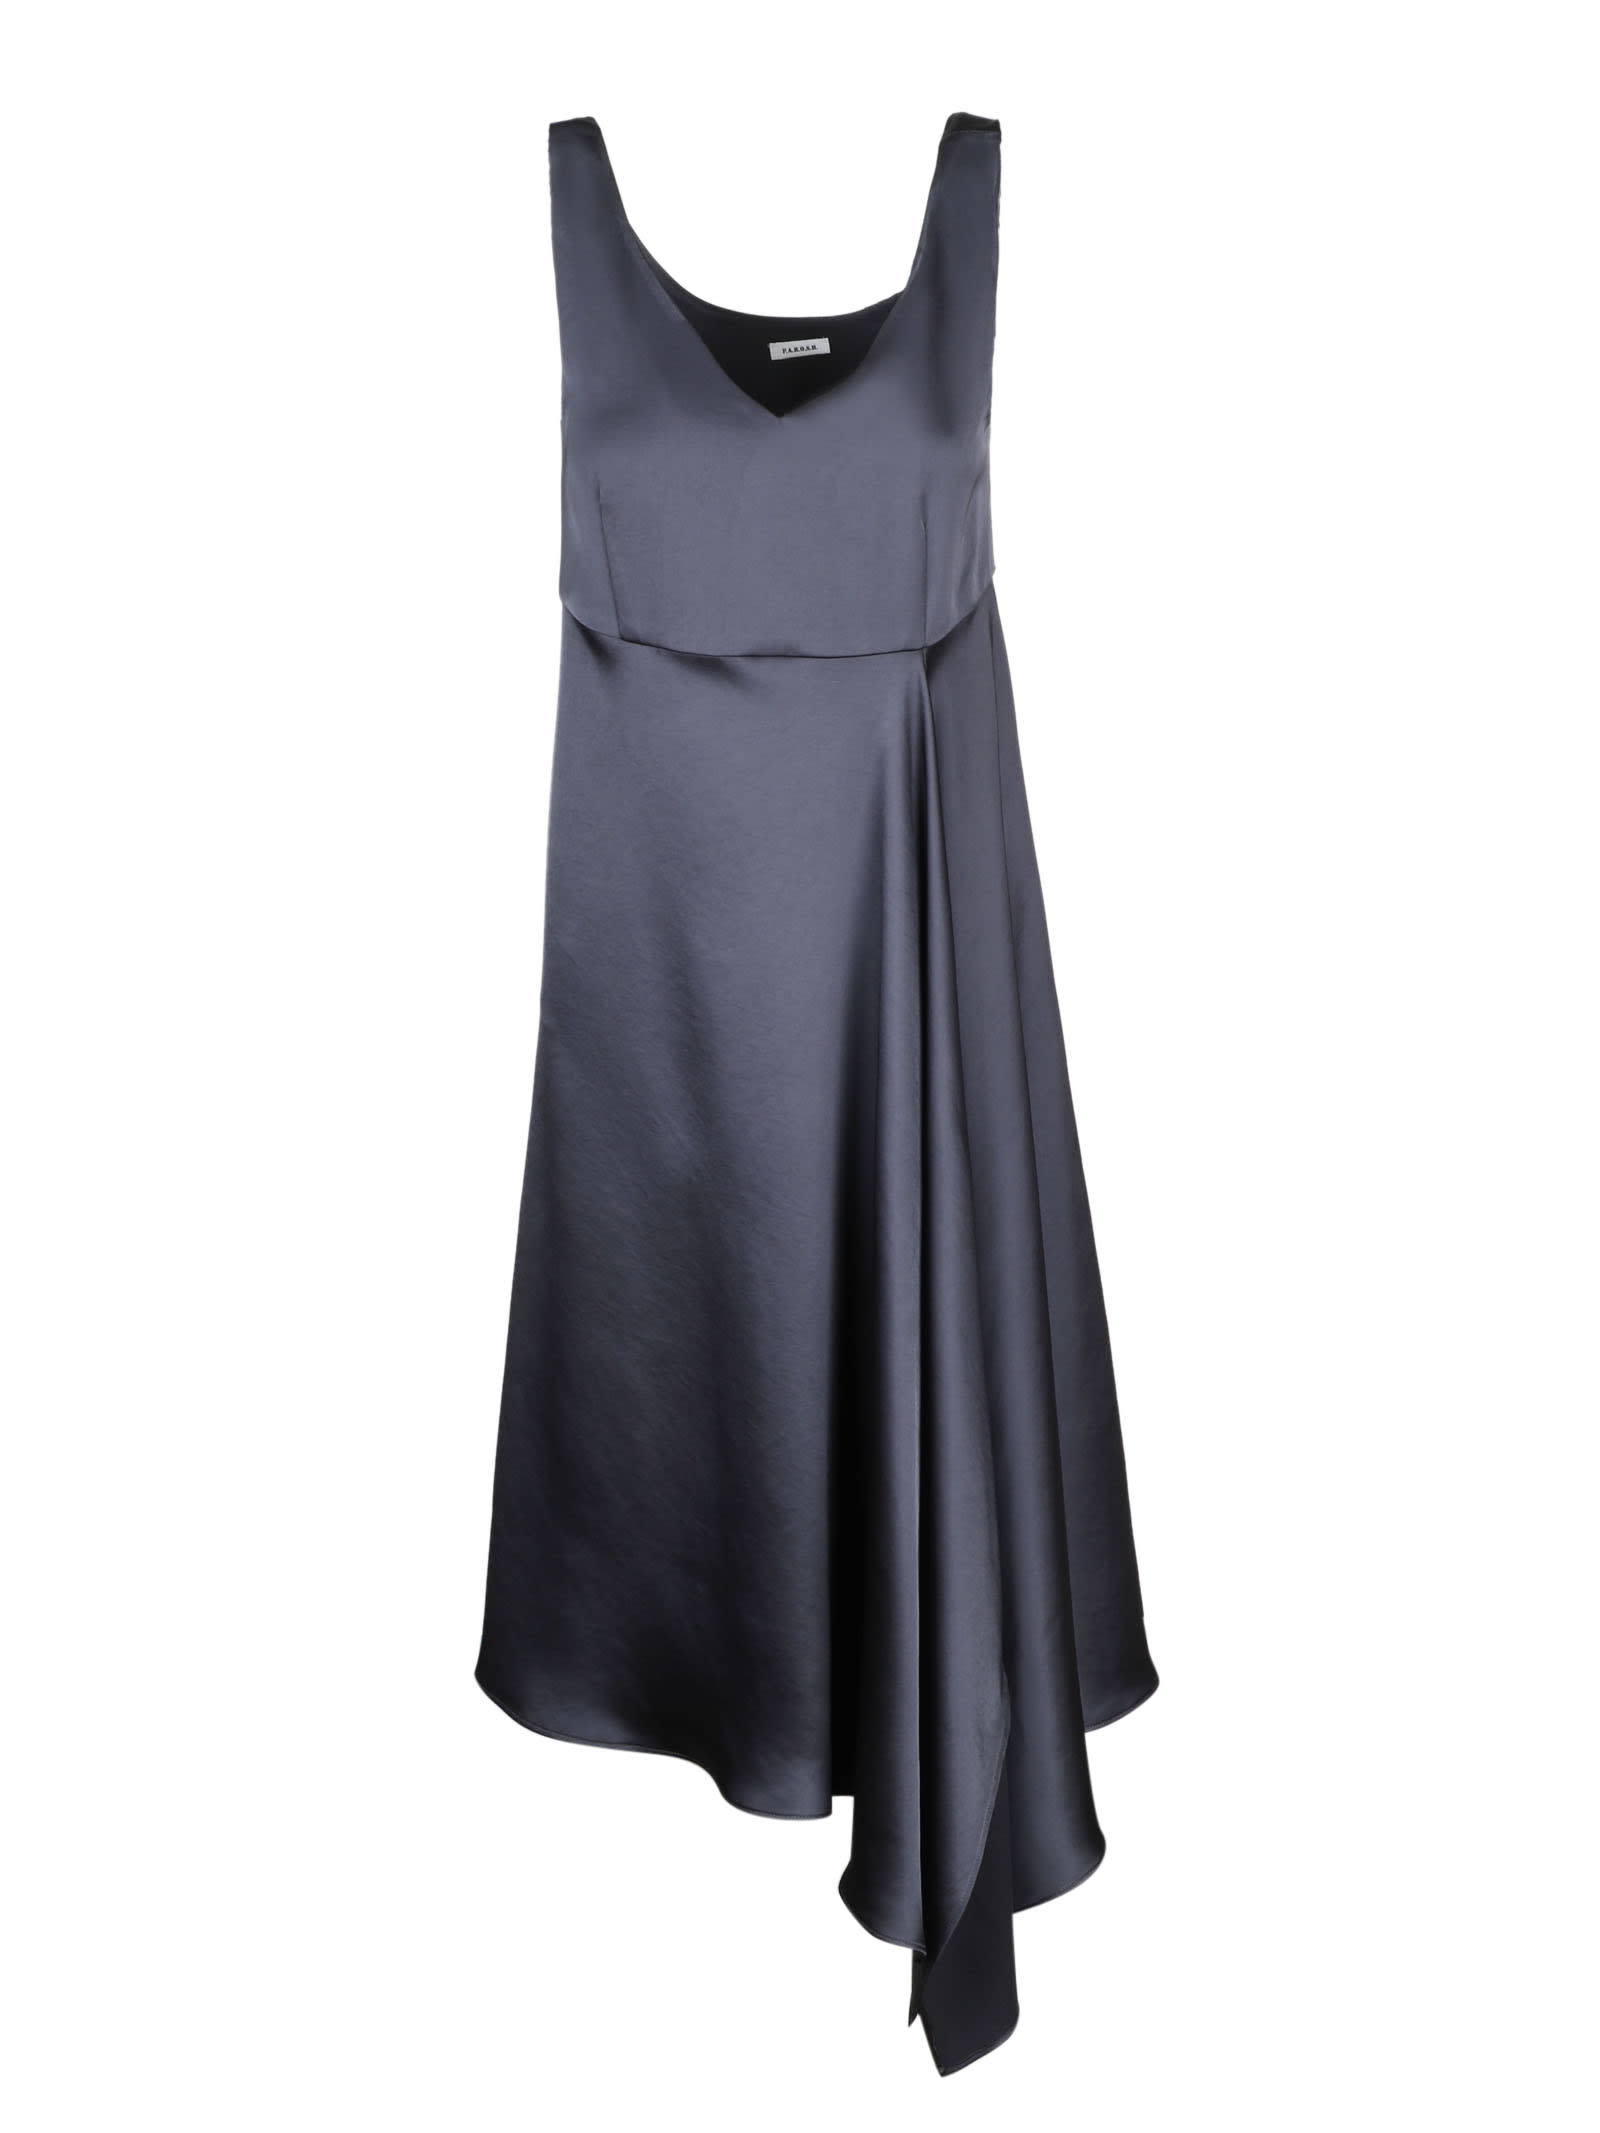 Parosh Privat Handkerchief Dress